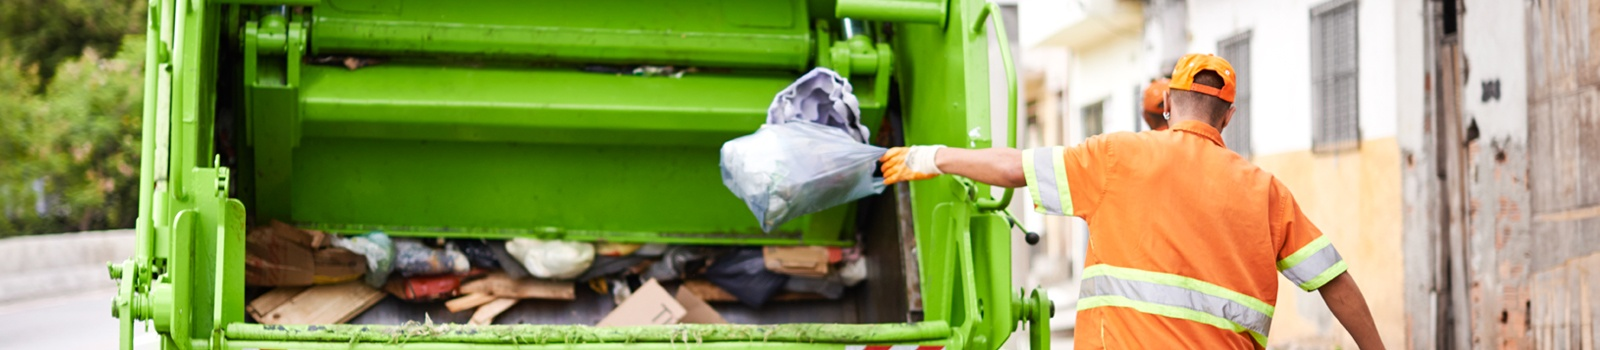 Waste Worker Loading Garbage Truck